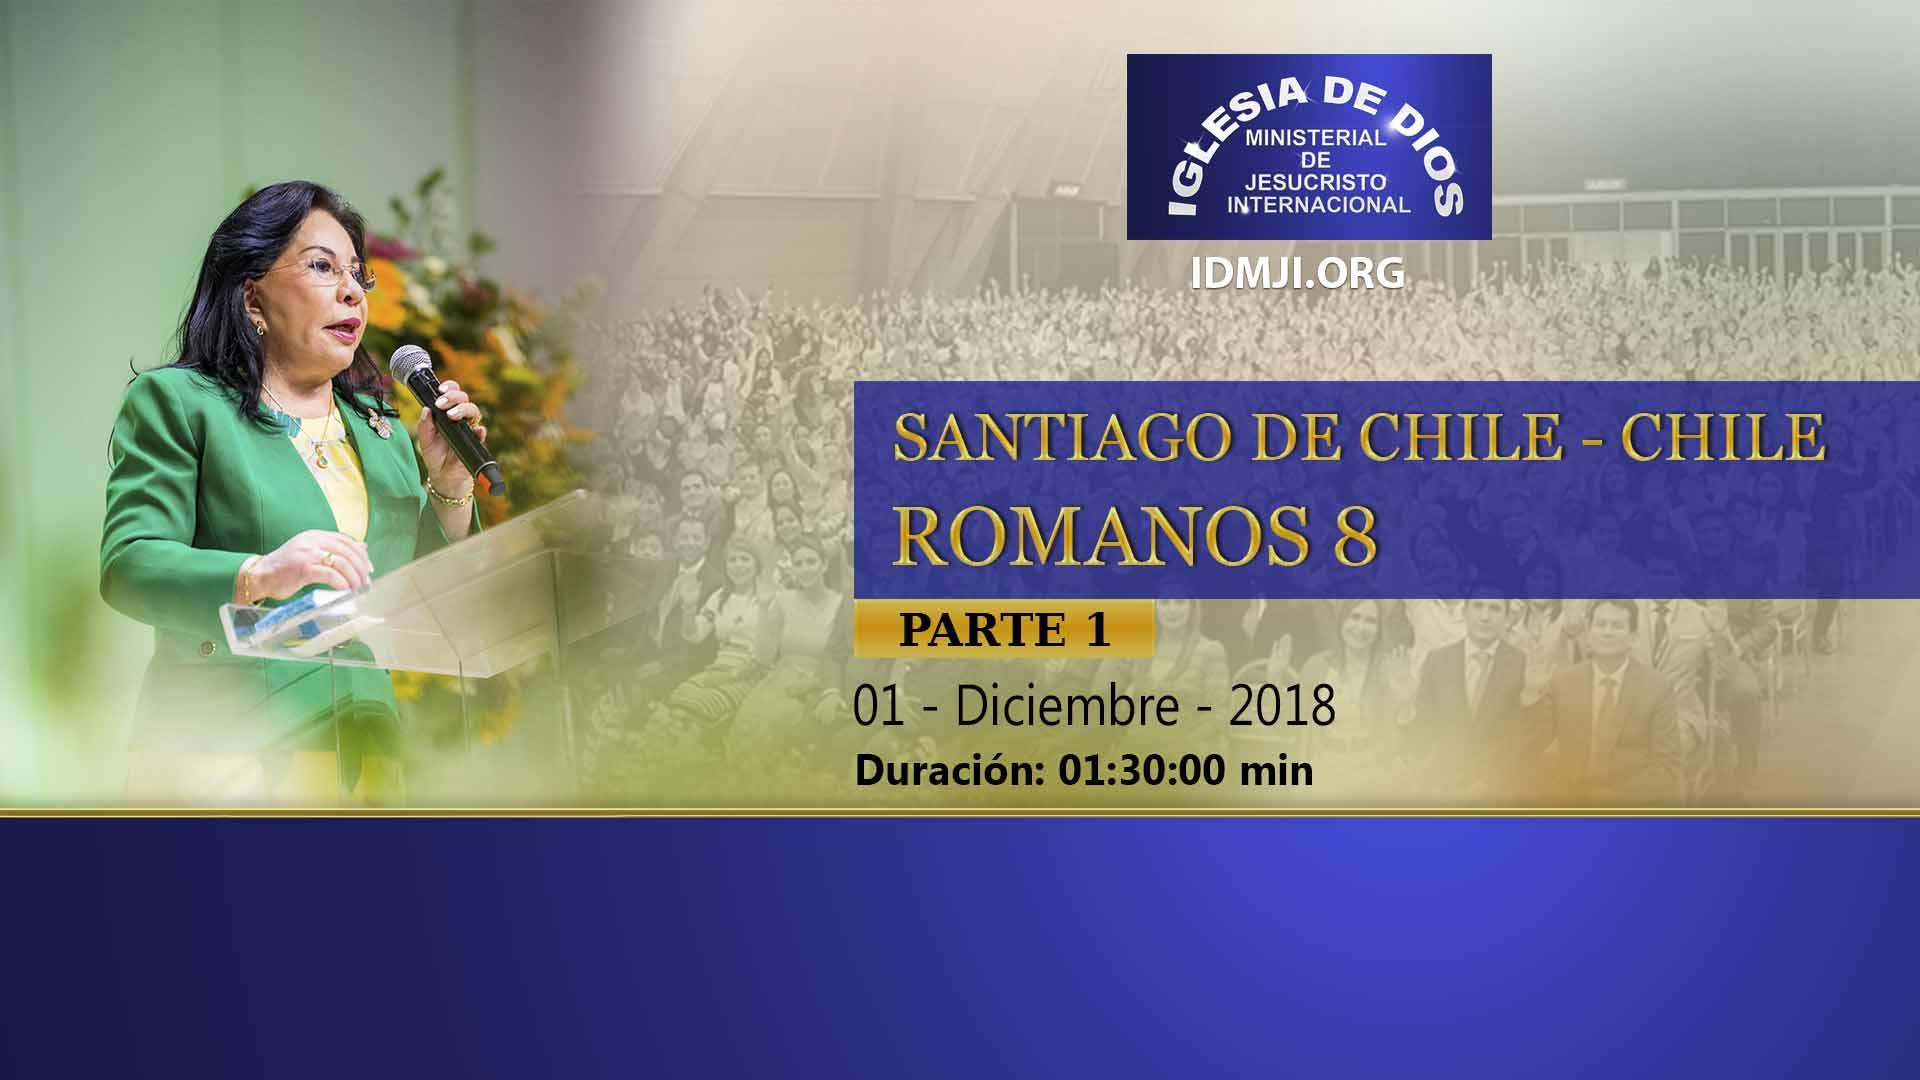 Romanos 8 – Parte 1